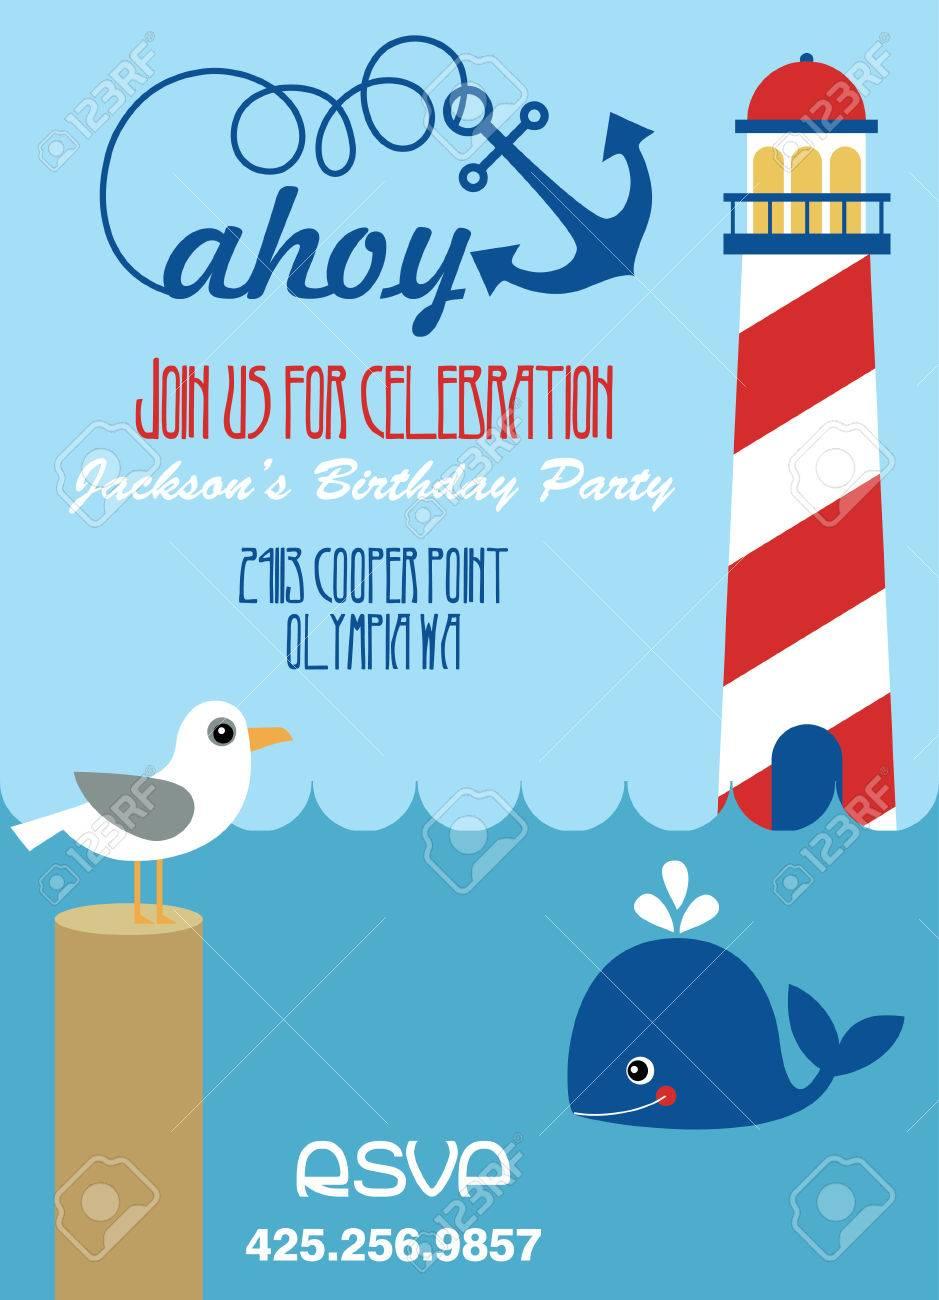 286 Ahoy Sea Stock Vector Illustration And Royalty Free Ahoy Sea ...